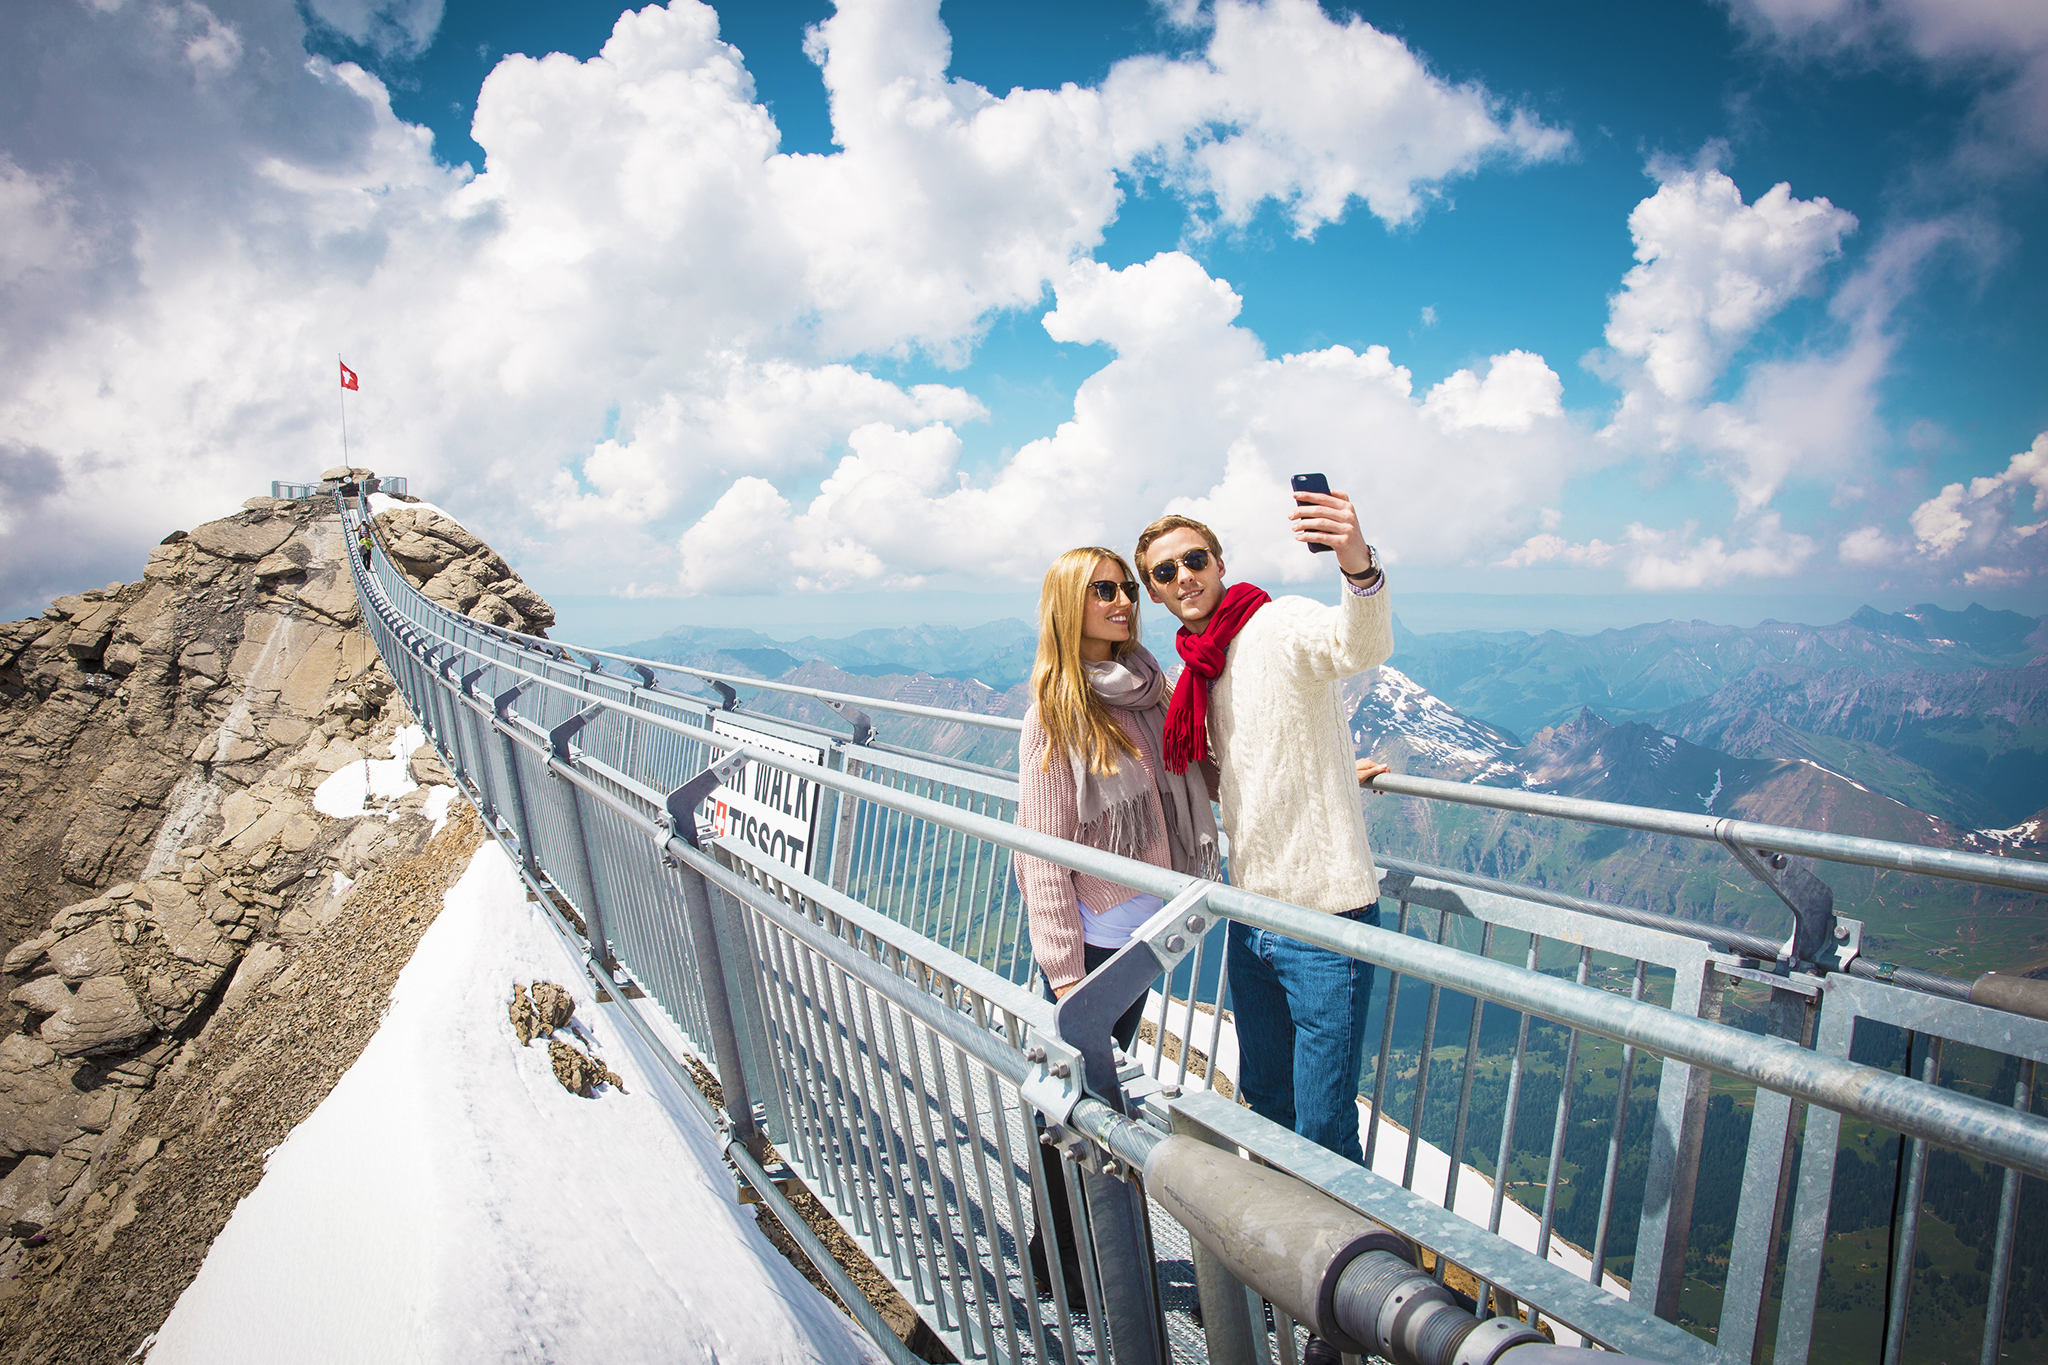 kt_2020_320_Keytours_excursions_Swisstours_glacier3000_peak_walk6_2048_10